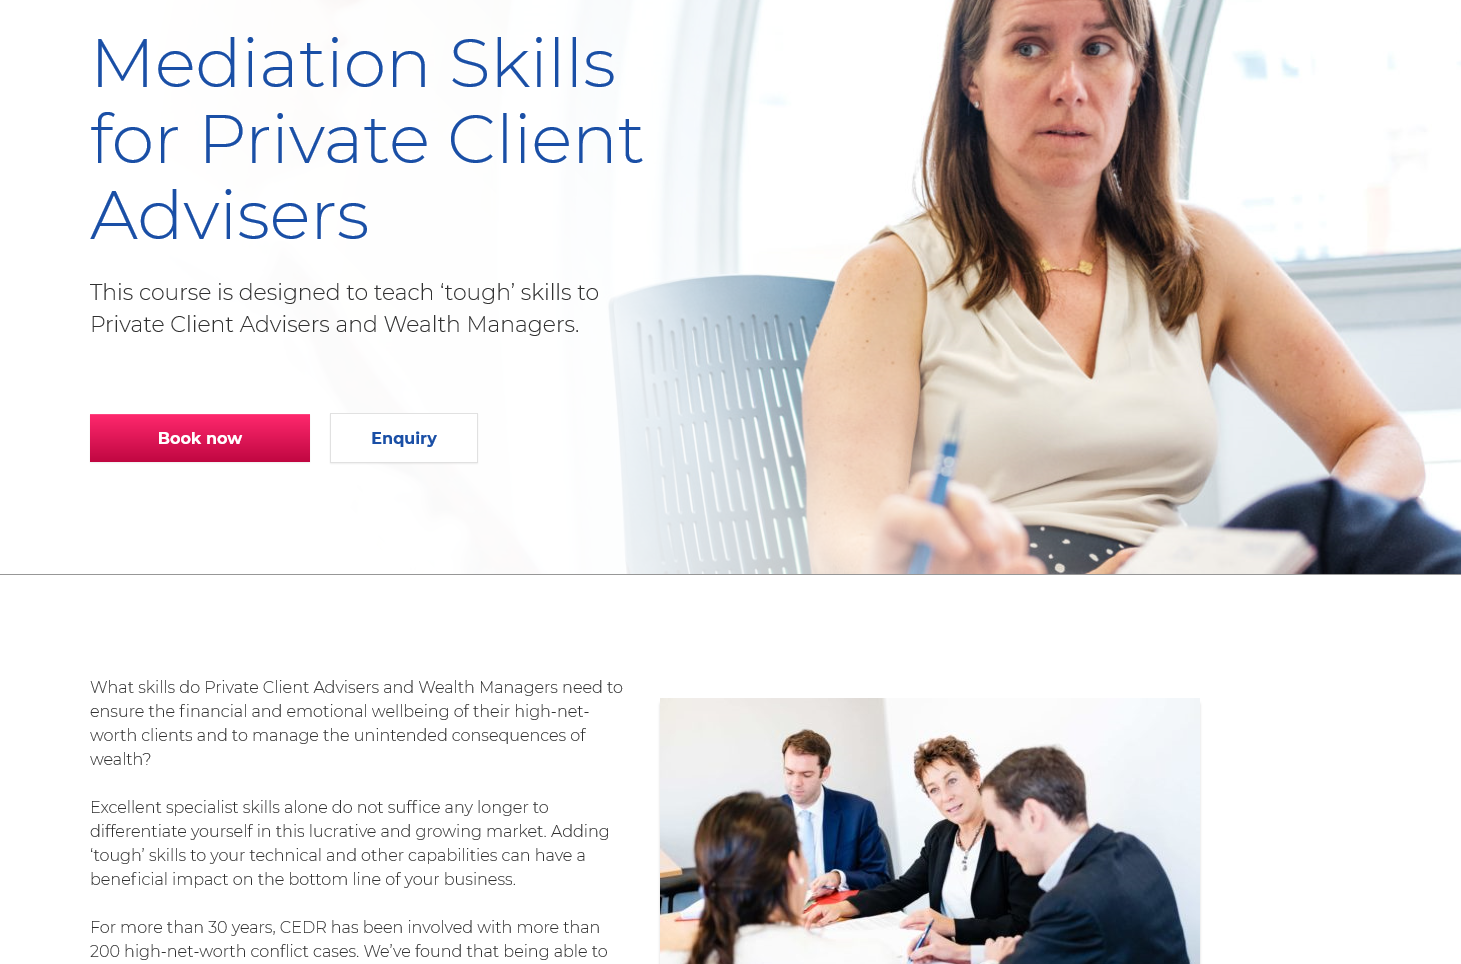 CEDR - mediation skills for HNW advisers